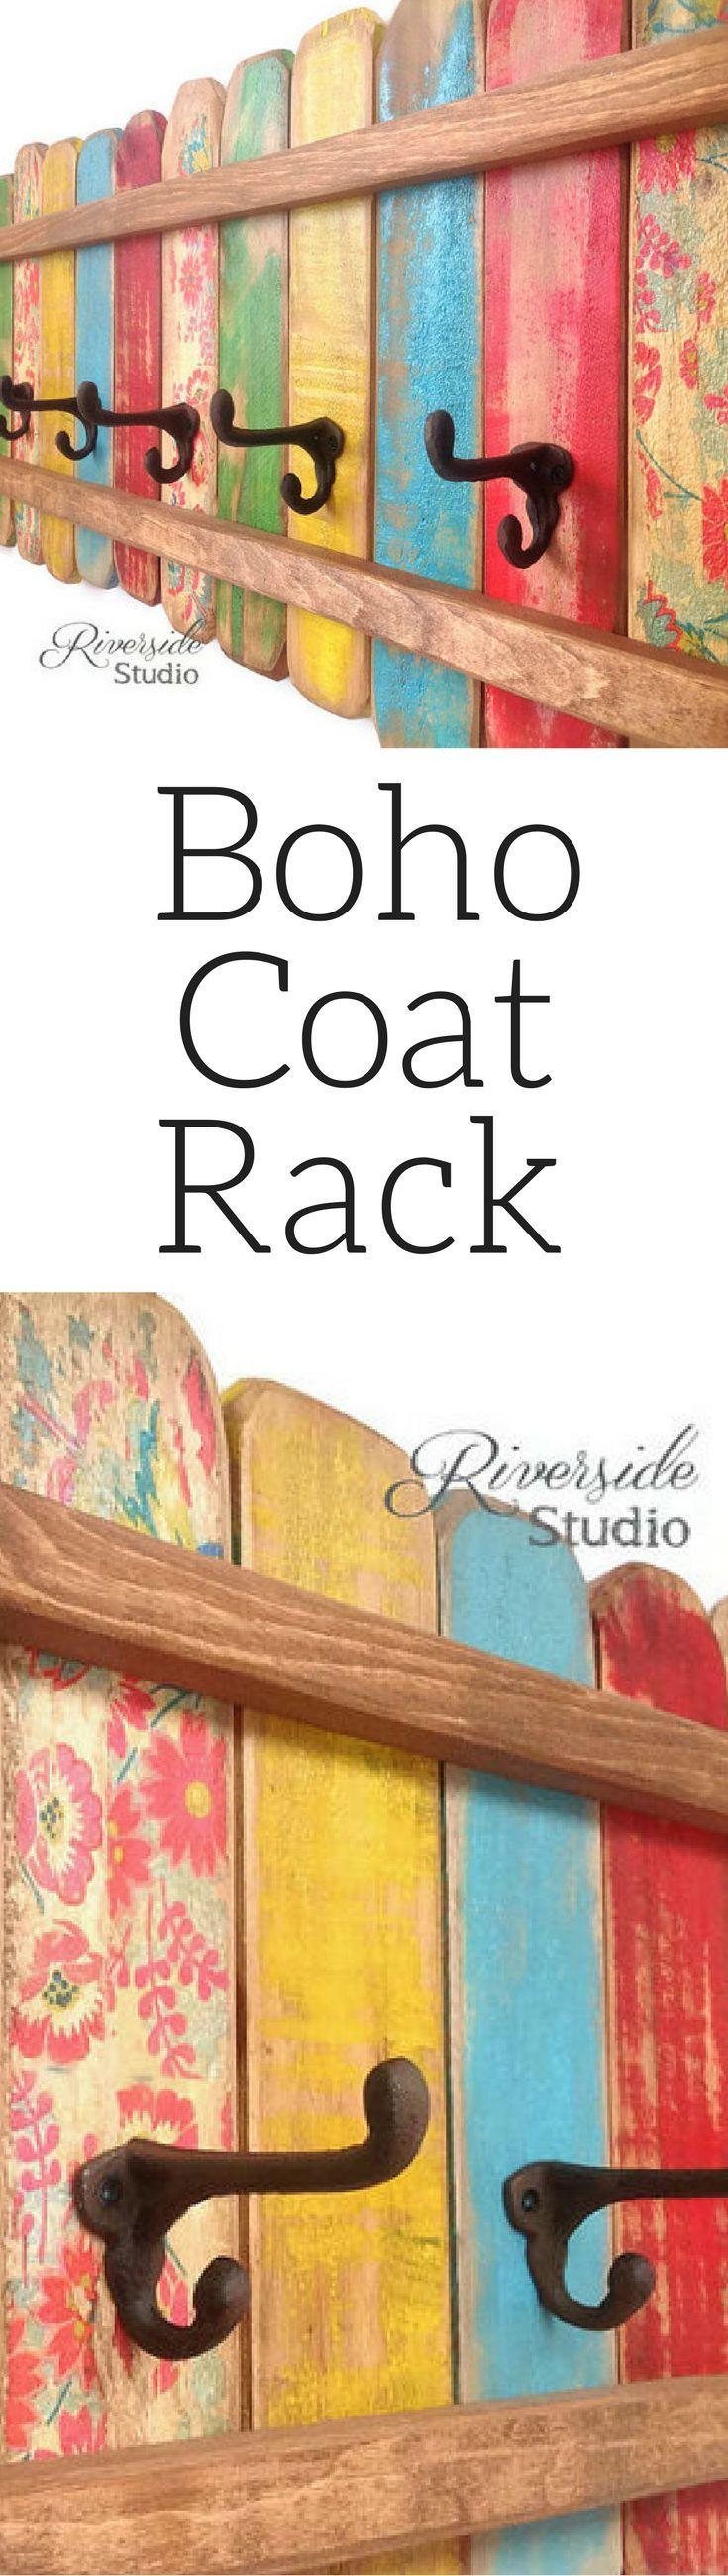 Love the colors!! Boho Floral Wood Coat Rack, Boho home decor,Cast Iron Coat Hook / Shabby Cottage Beach Chic Coat Rack, Bohemian Furniture, Bathroom Towel rack #ad #affiliatelink